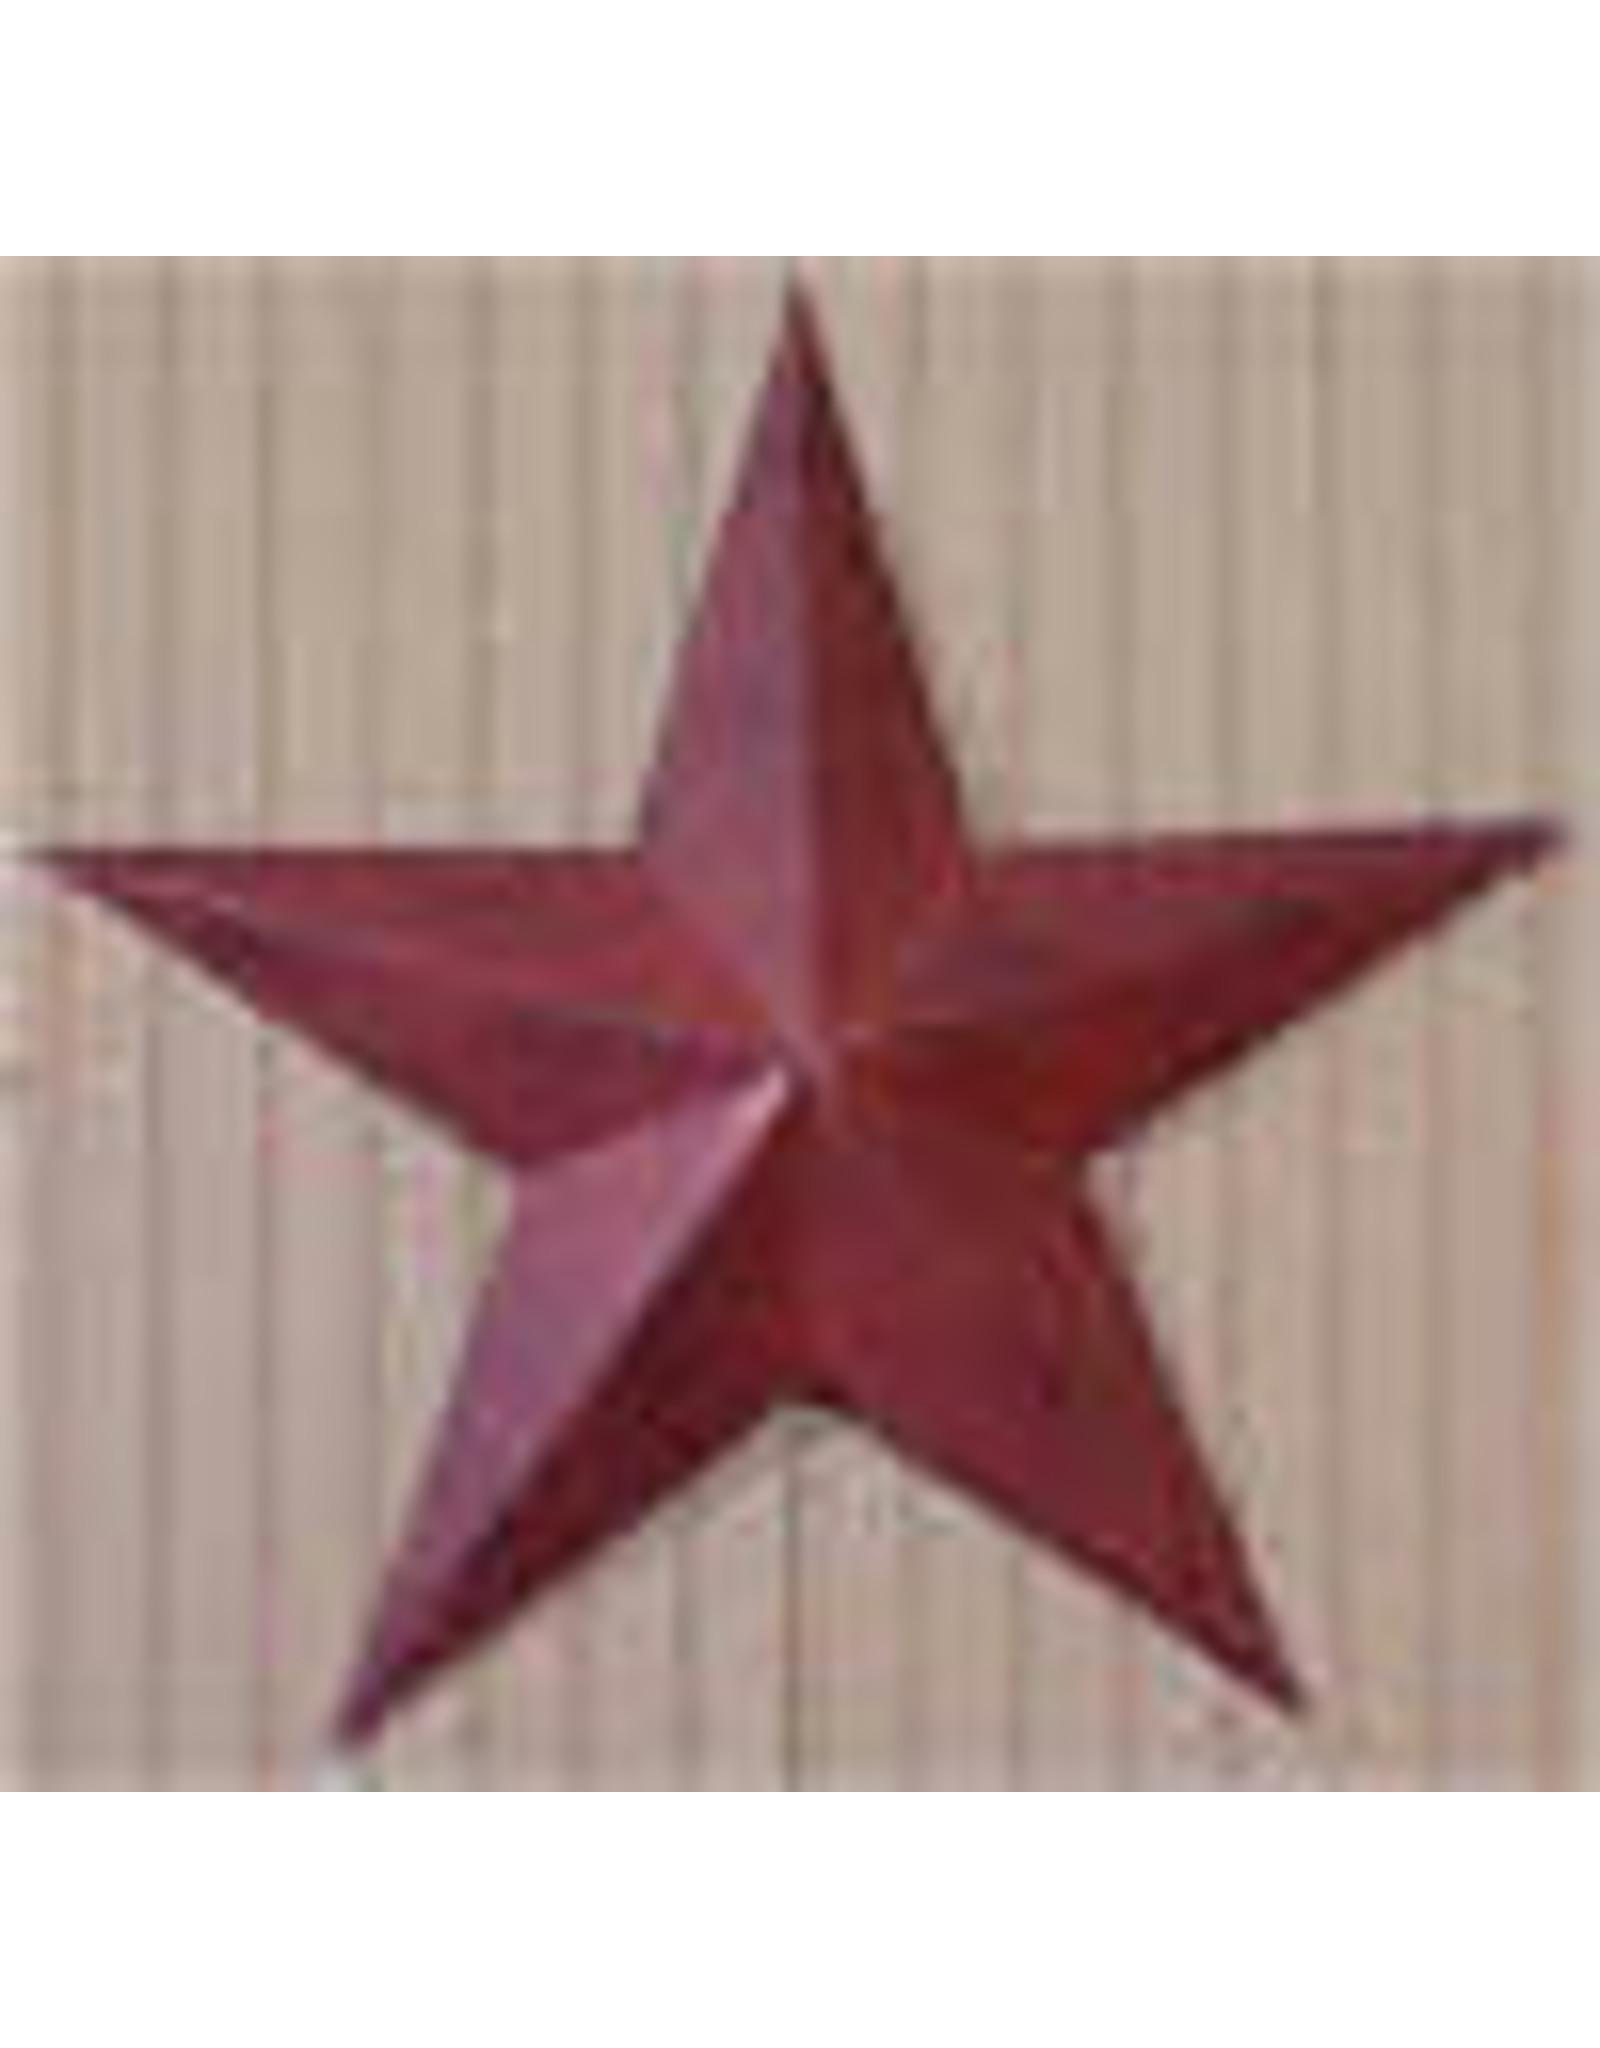 "BURGUNDY RUSTY BARN STAR 24"""